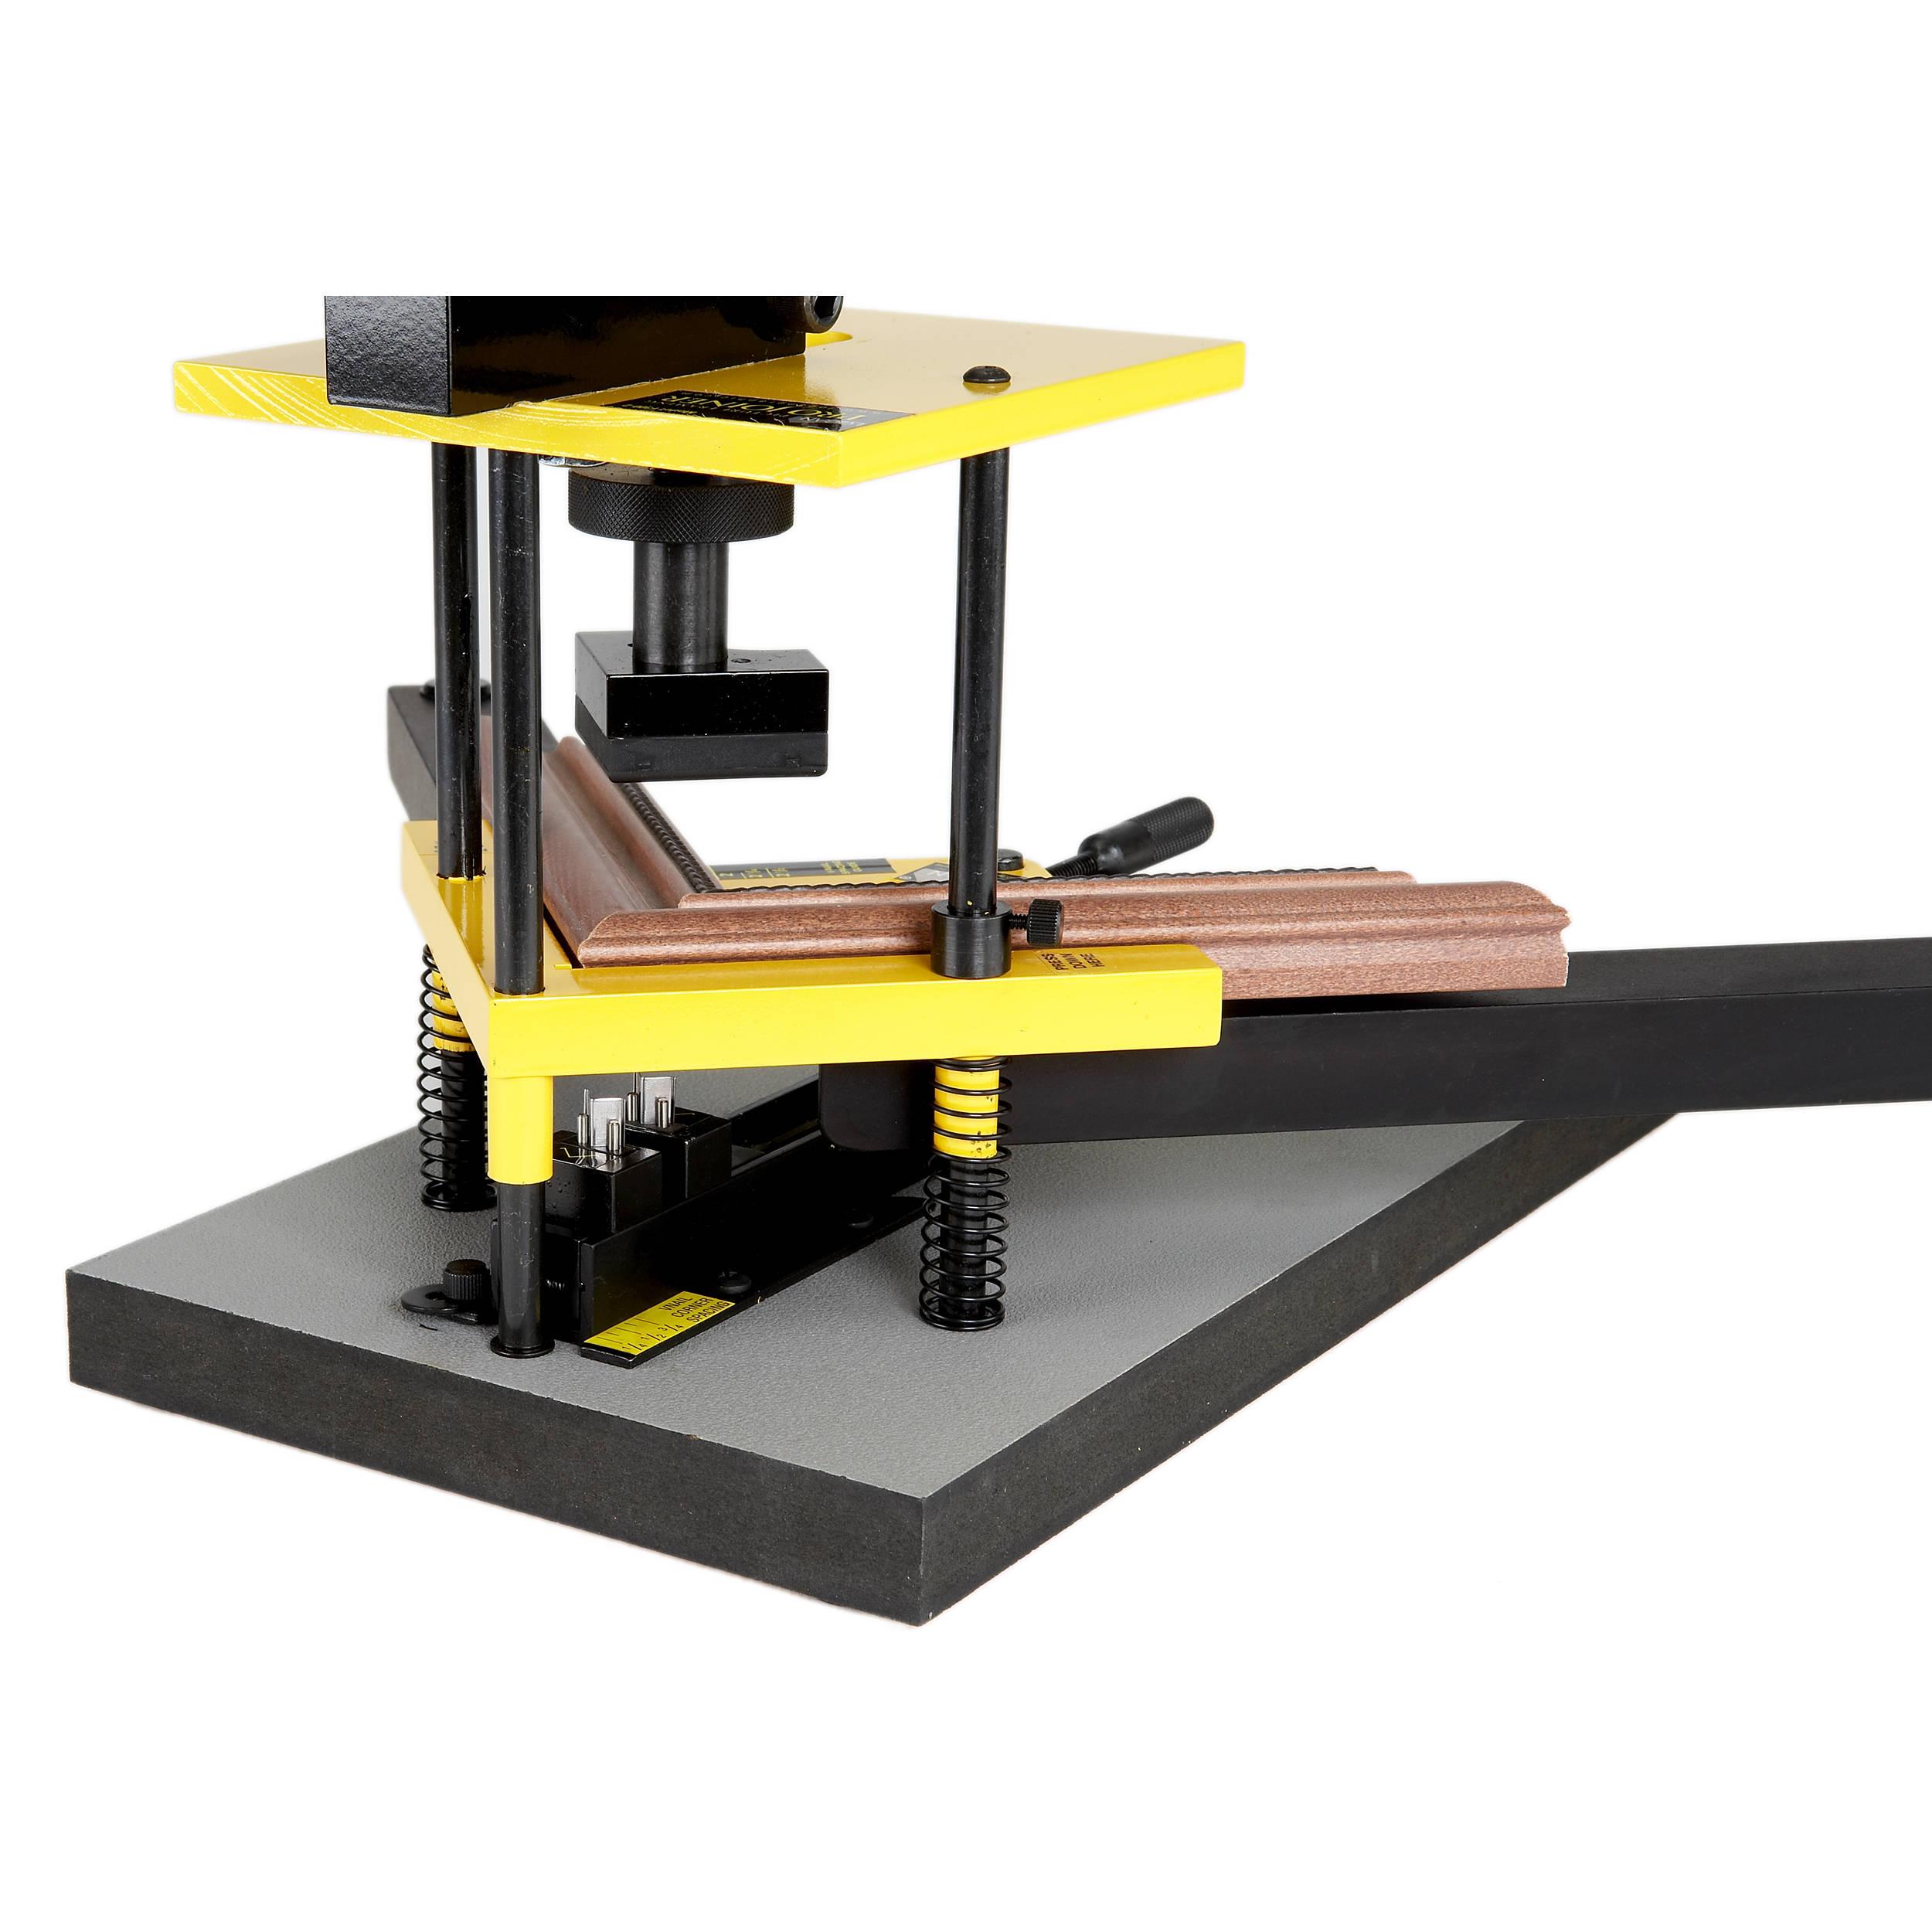 Logan Graphics F300-2 Pro Wood Frame Joiner Tool F300-2 B&H